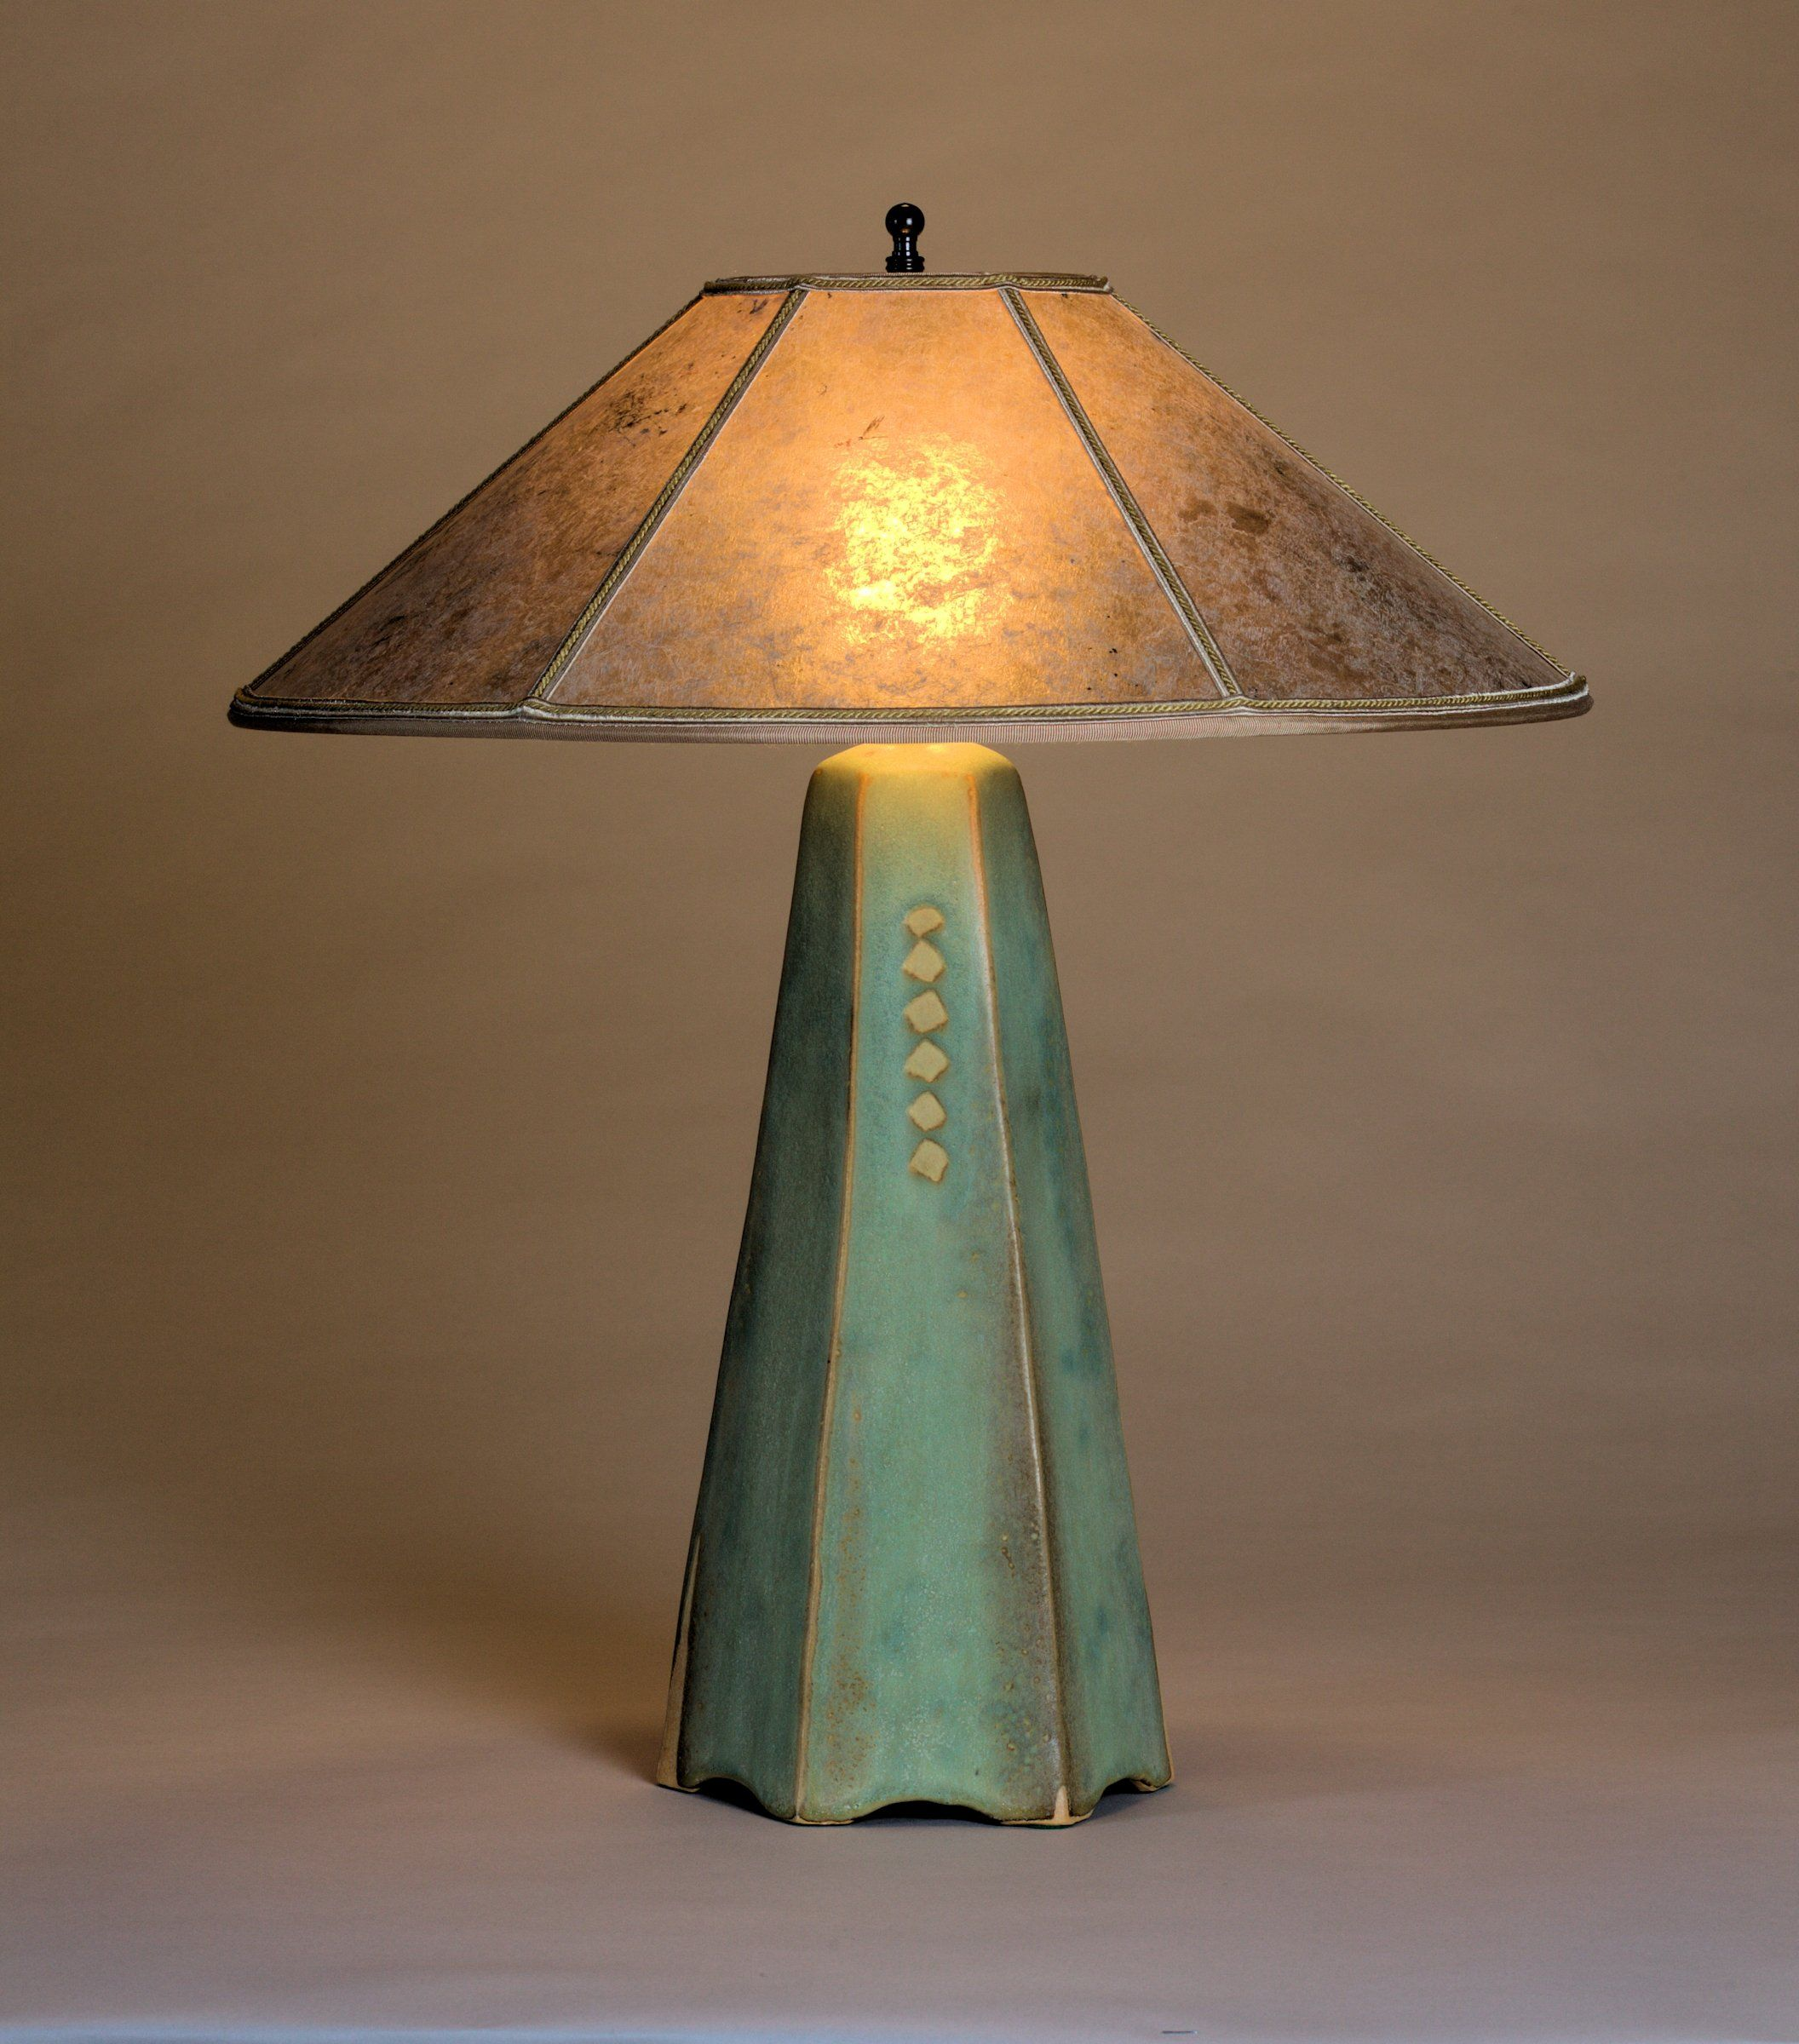 Six Sided Lamp In Celery Glaze By Jim Webb (Ceramic Table Lamp